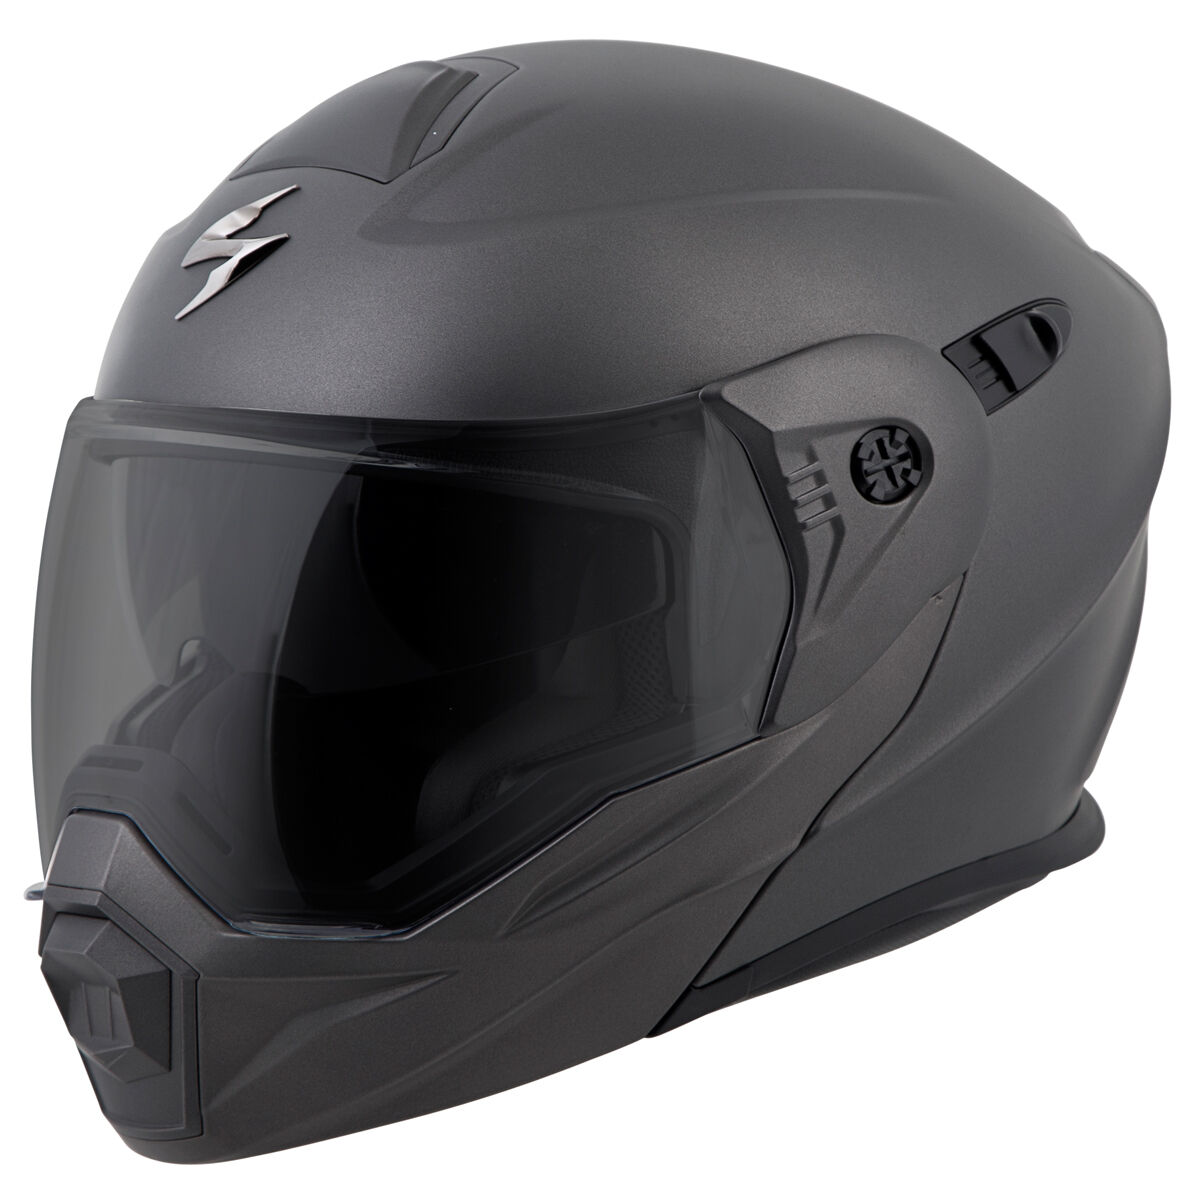 Scorpion EXO-AT950 Motorcyle Helmet